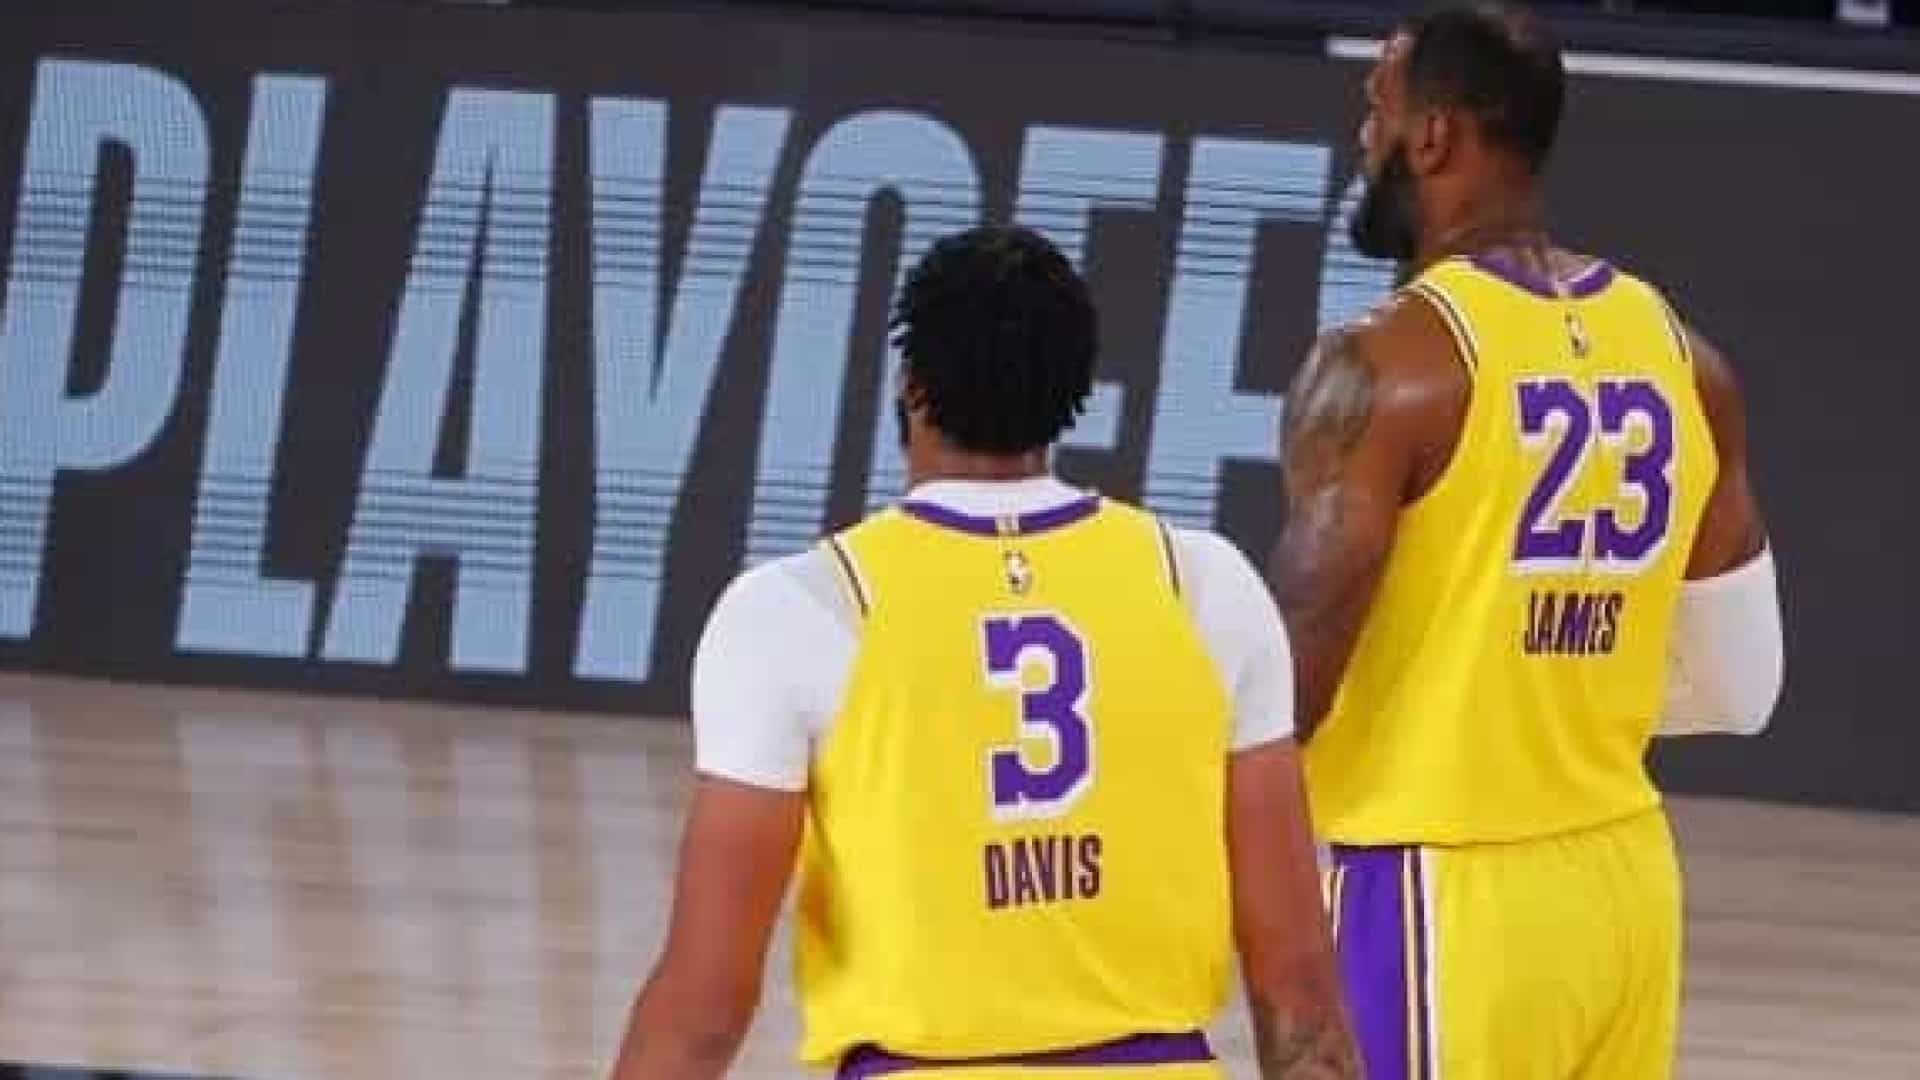 Lebron e Davis lideram o Lakers na vitória sobre o Houston Rockets